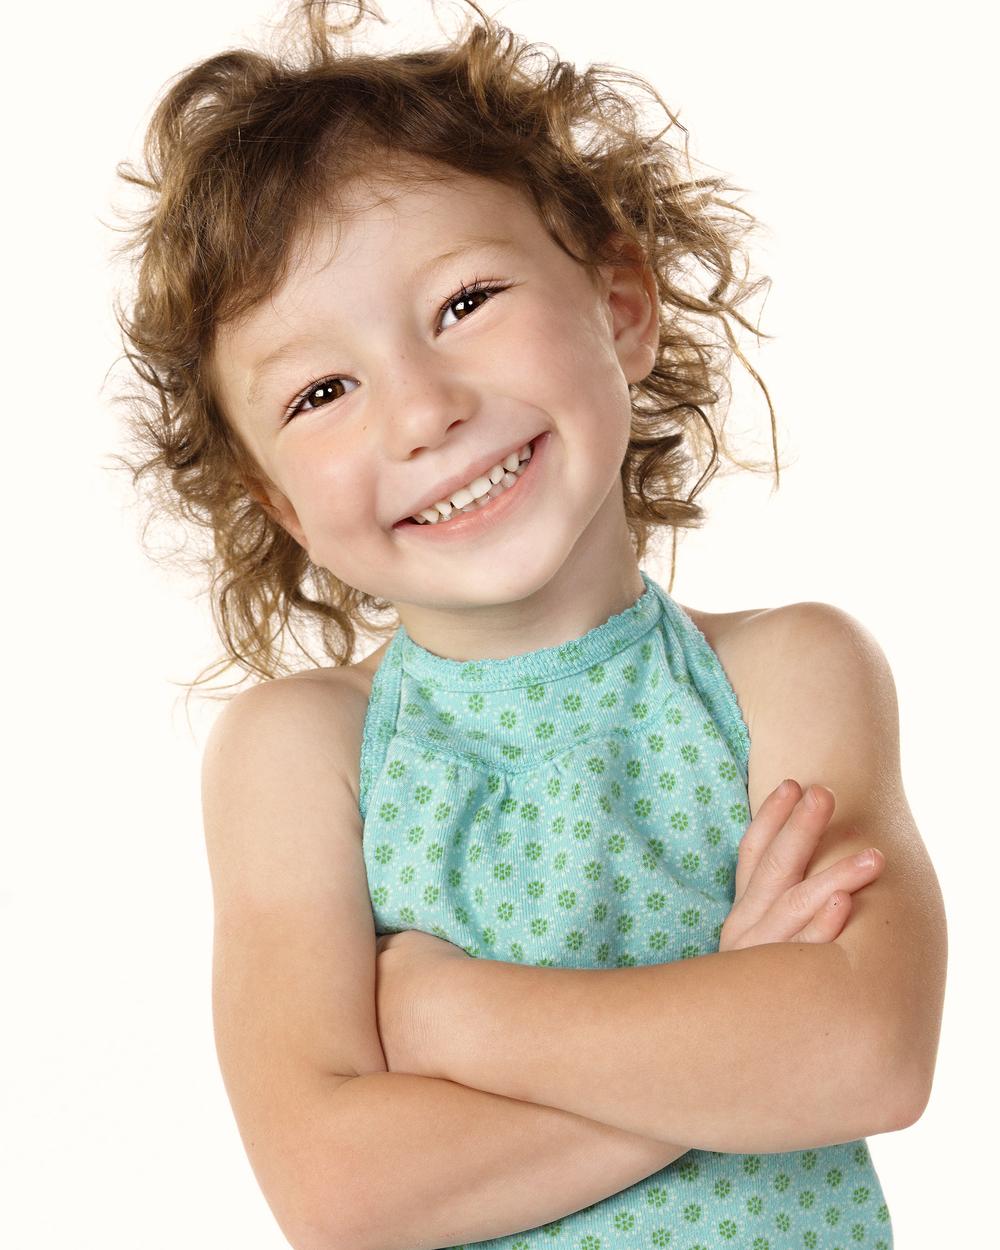 children's photographer, girl,photography, photographer, greenwich, darien, norwalk, stamford, rye, white plains